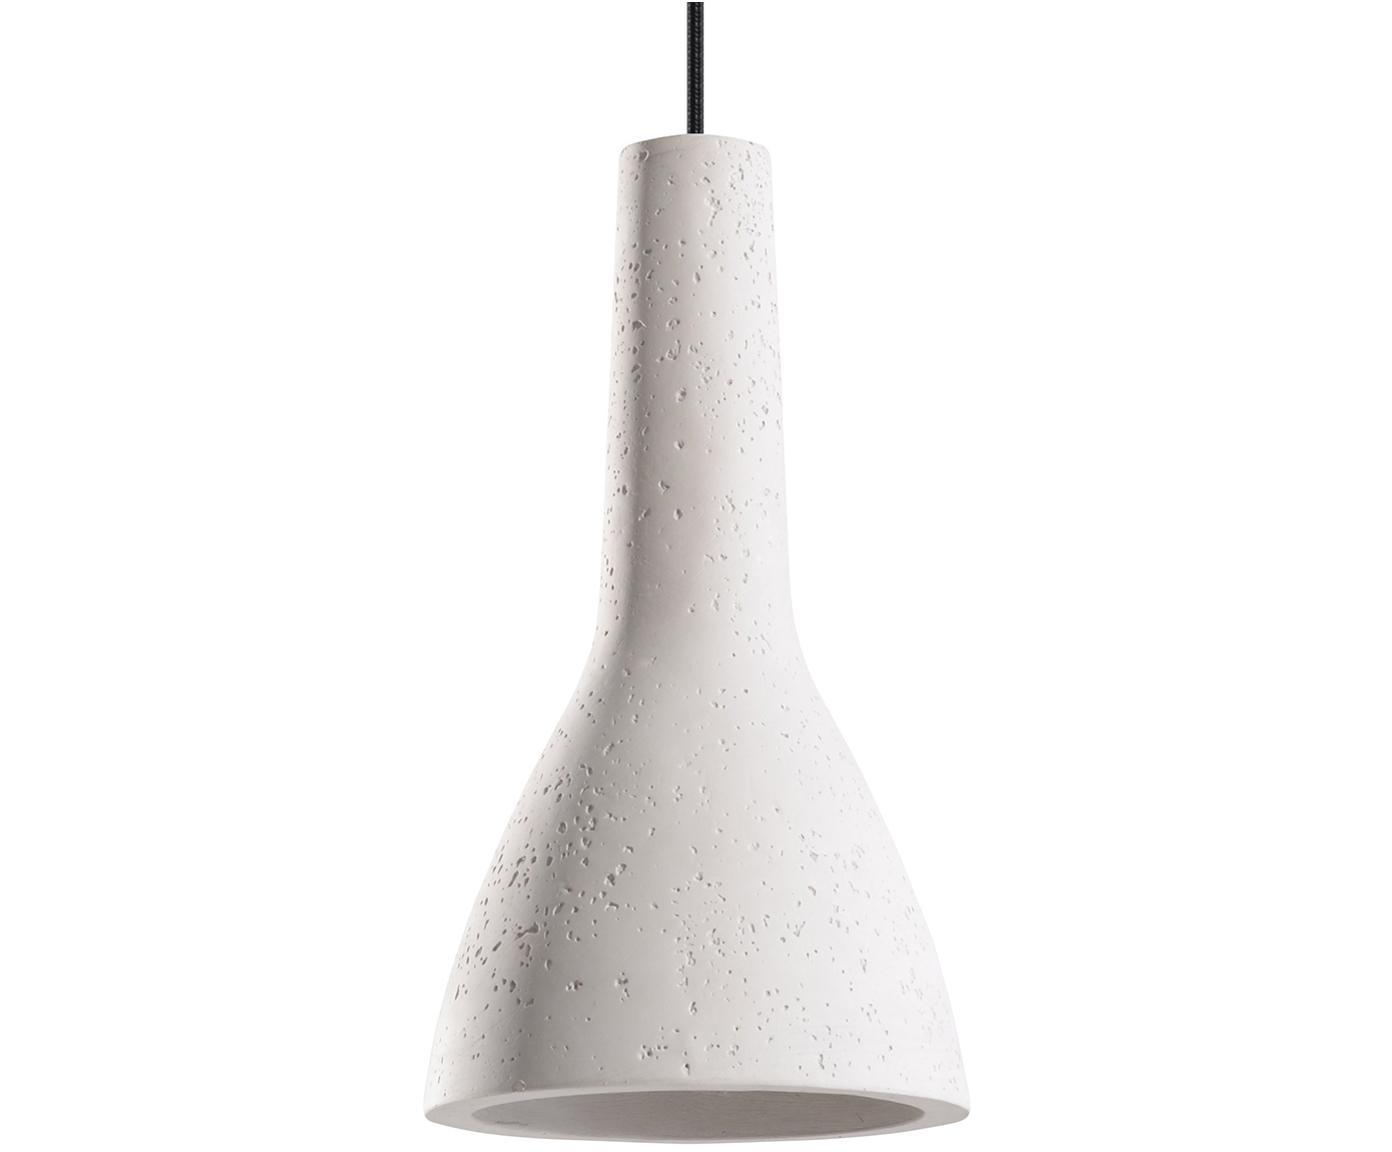 Lampada a sospensione Mattia, Cemento, Bianco, Ø 17 x Alt. 100 cm